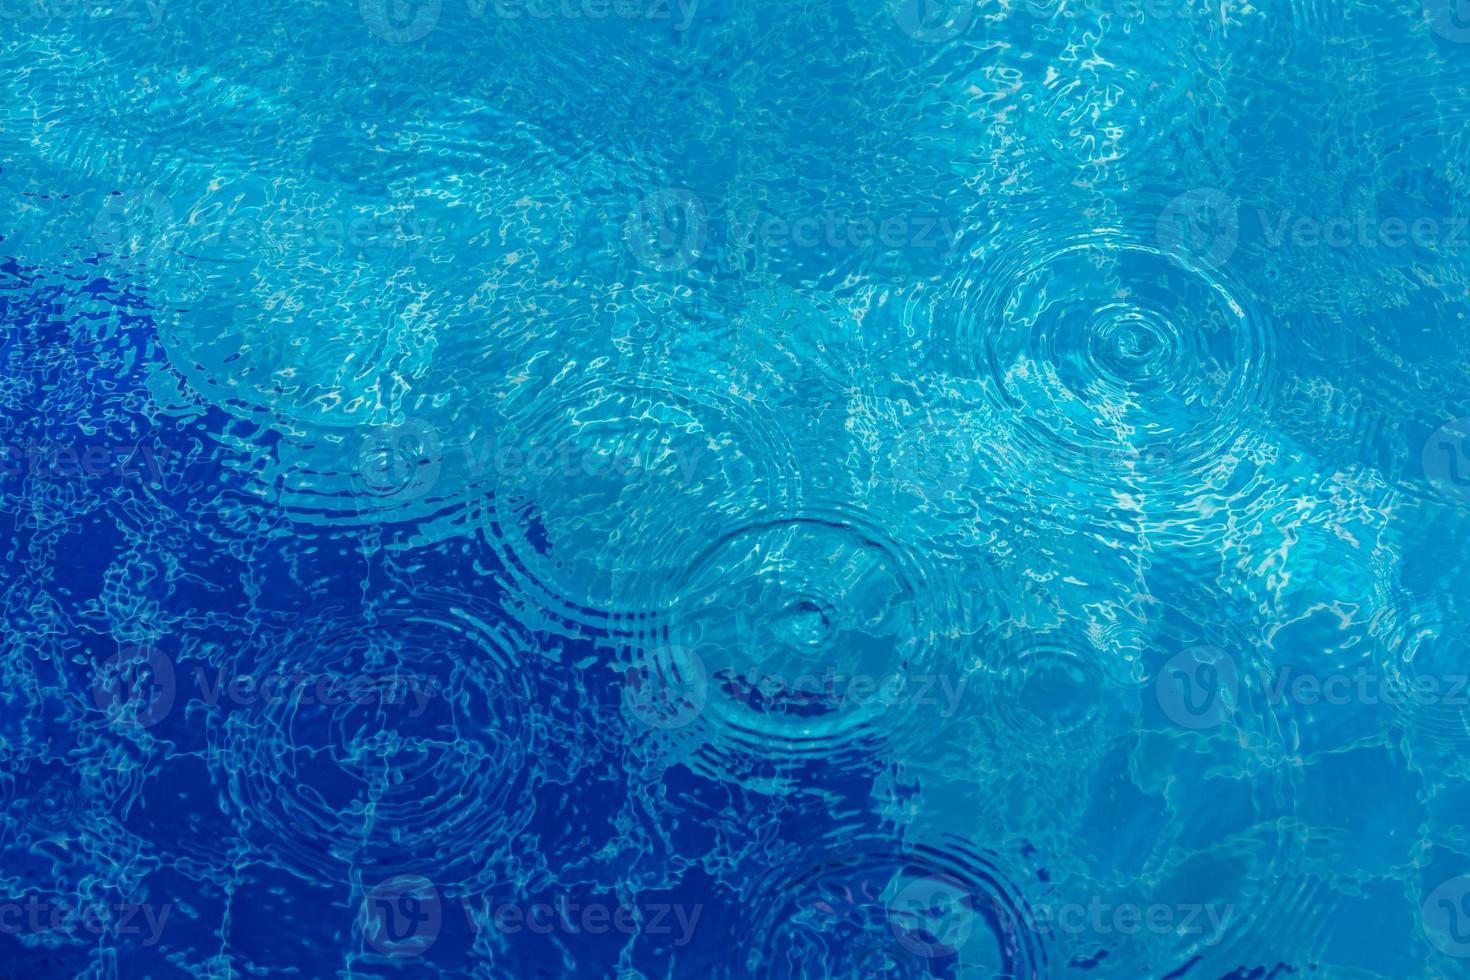 waterdruppel rimpel achtergrond foto